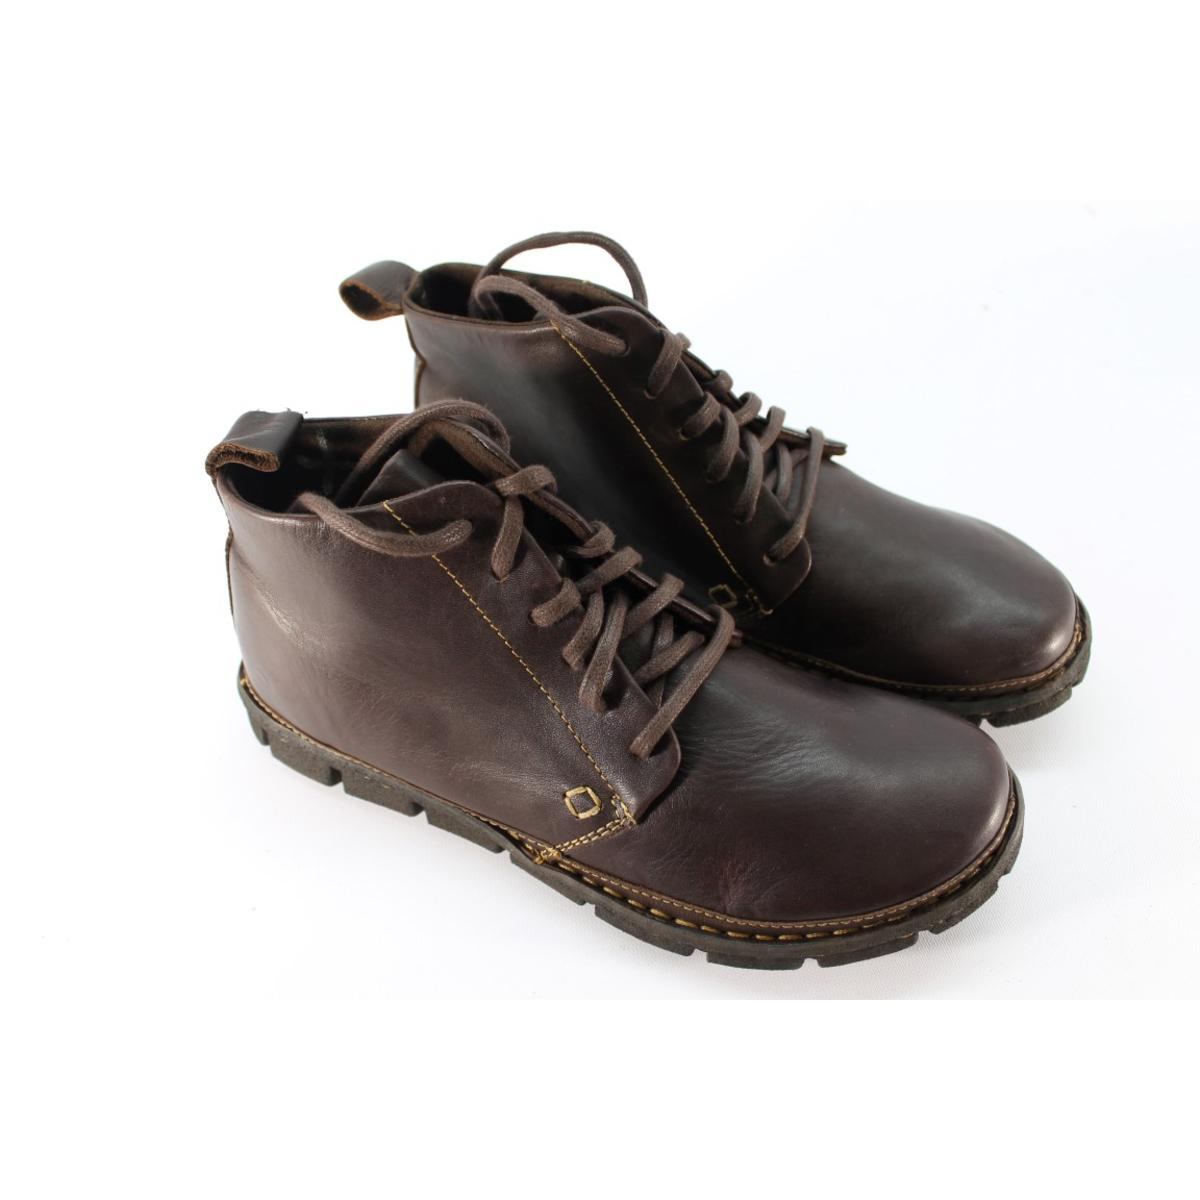 born s jax brown leather chukka boots 9m ebay